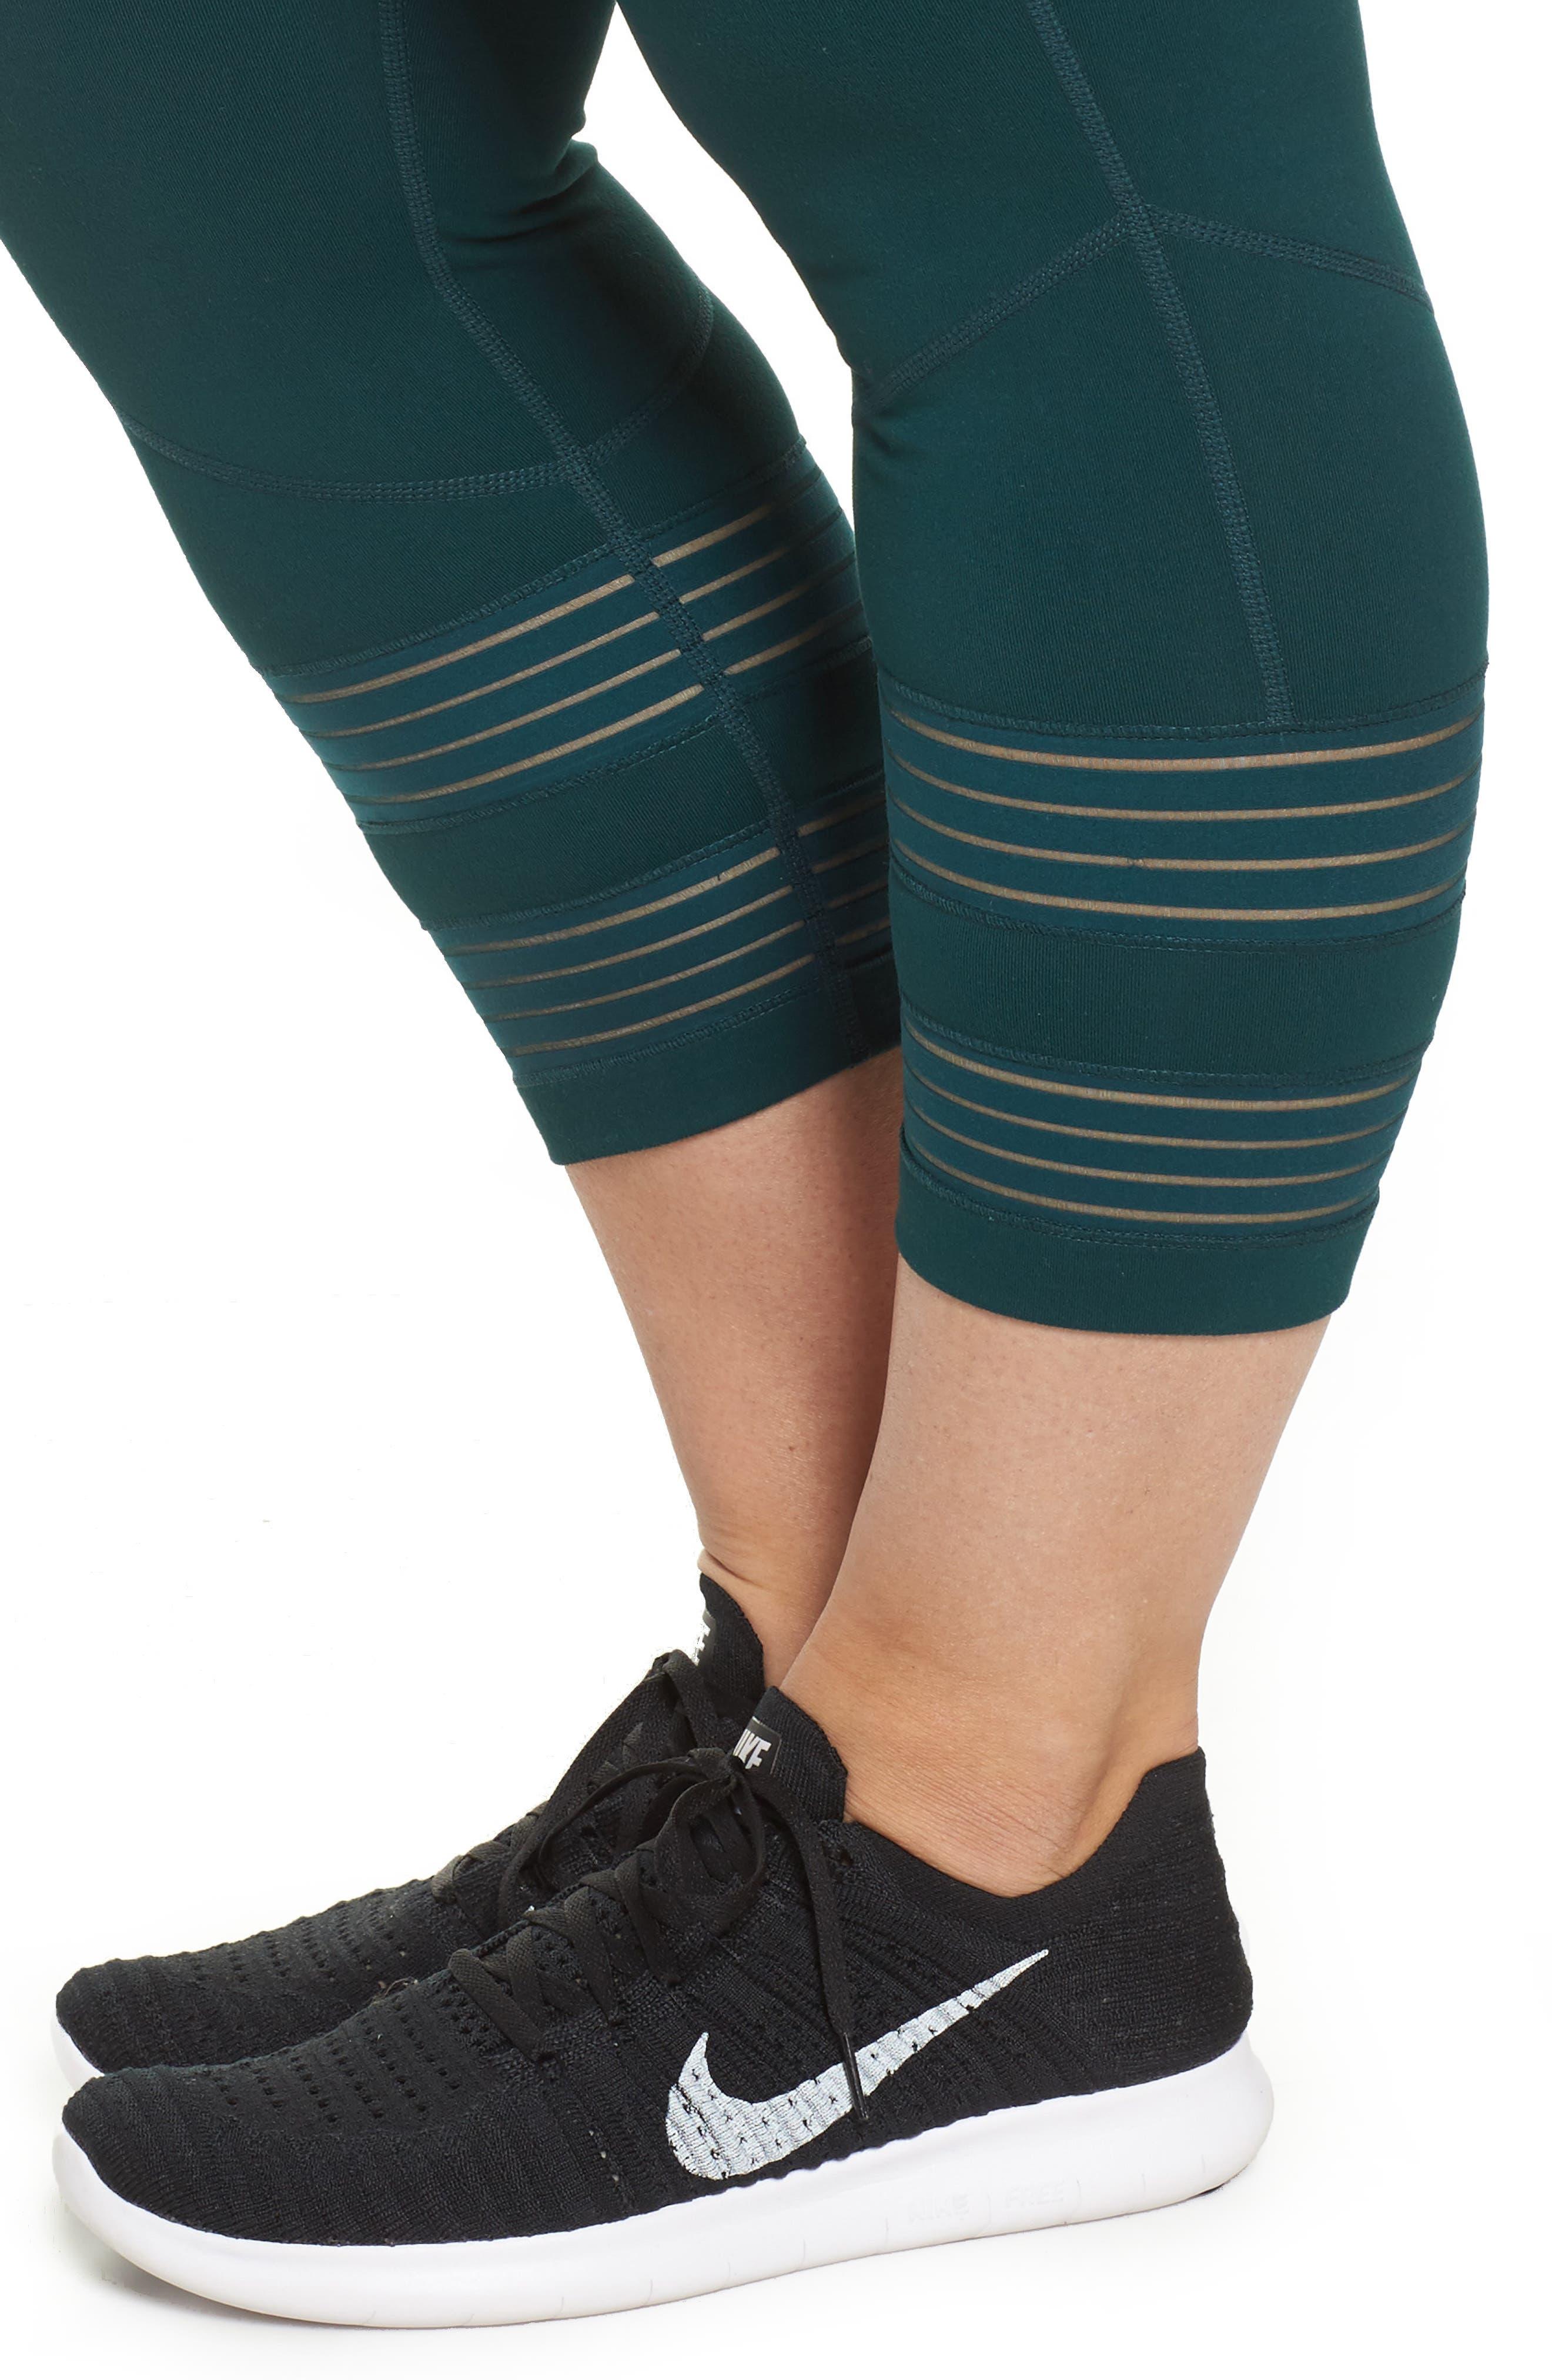 Twin High Waist Crop Leggings,                             Alternate thumbnail 4, color,                             Green Ponderosa